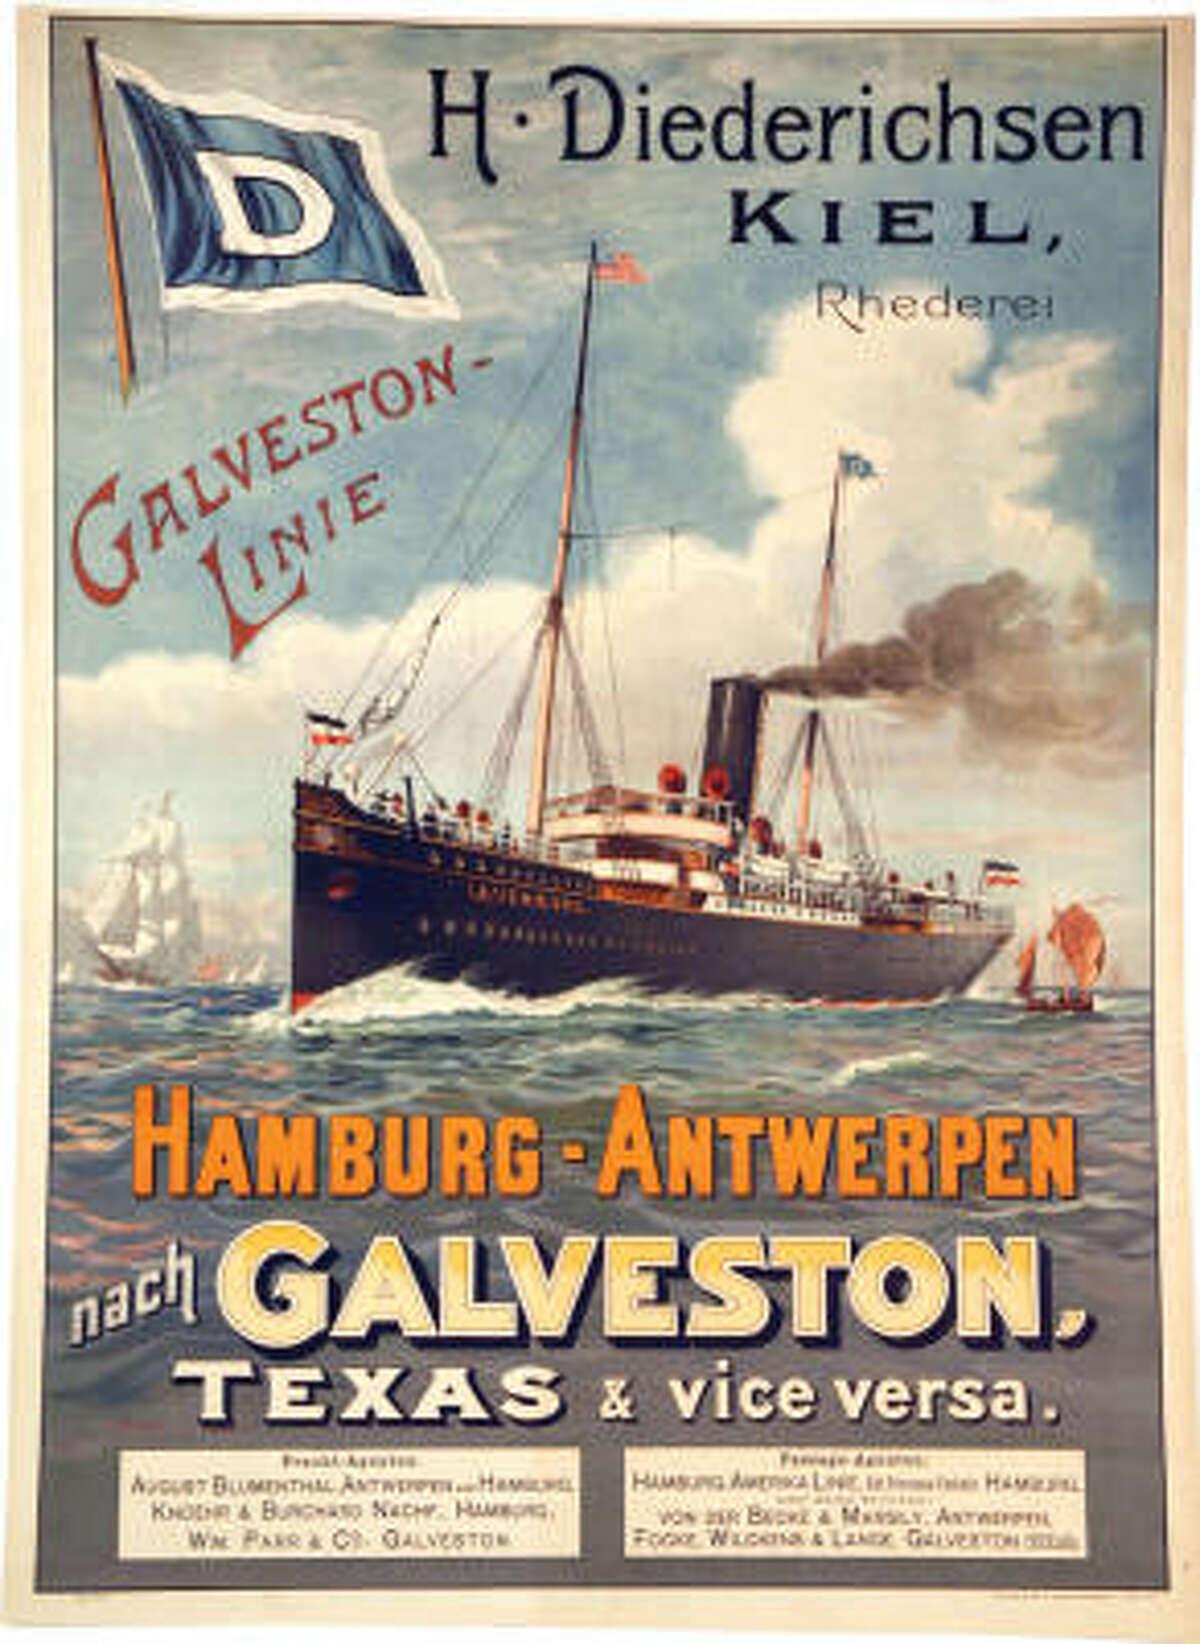 A Hamburg-Antwerpen poster touts Galveston.